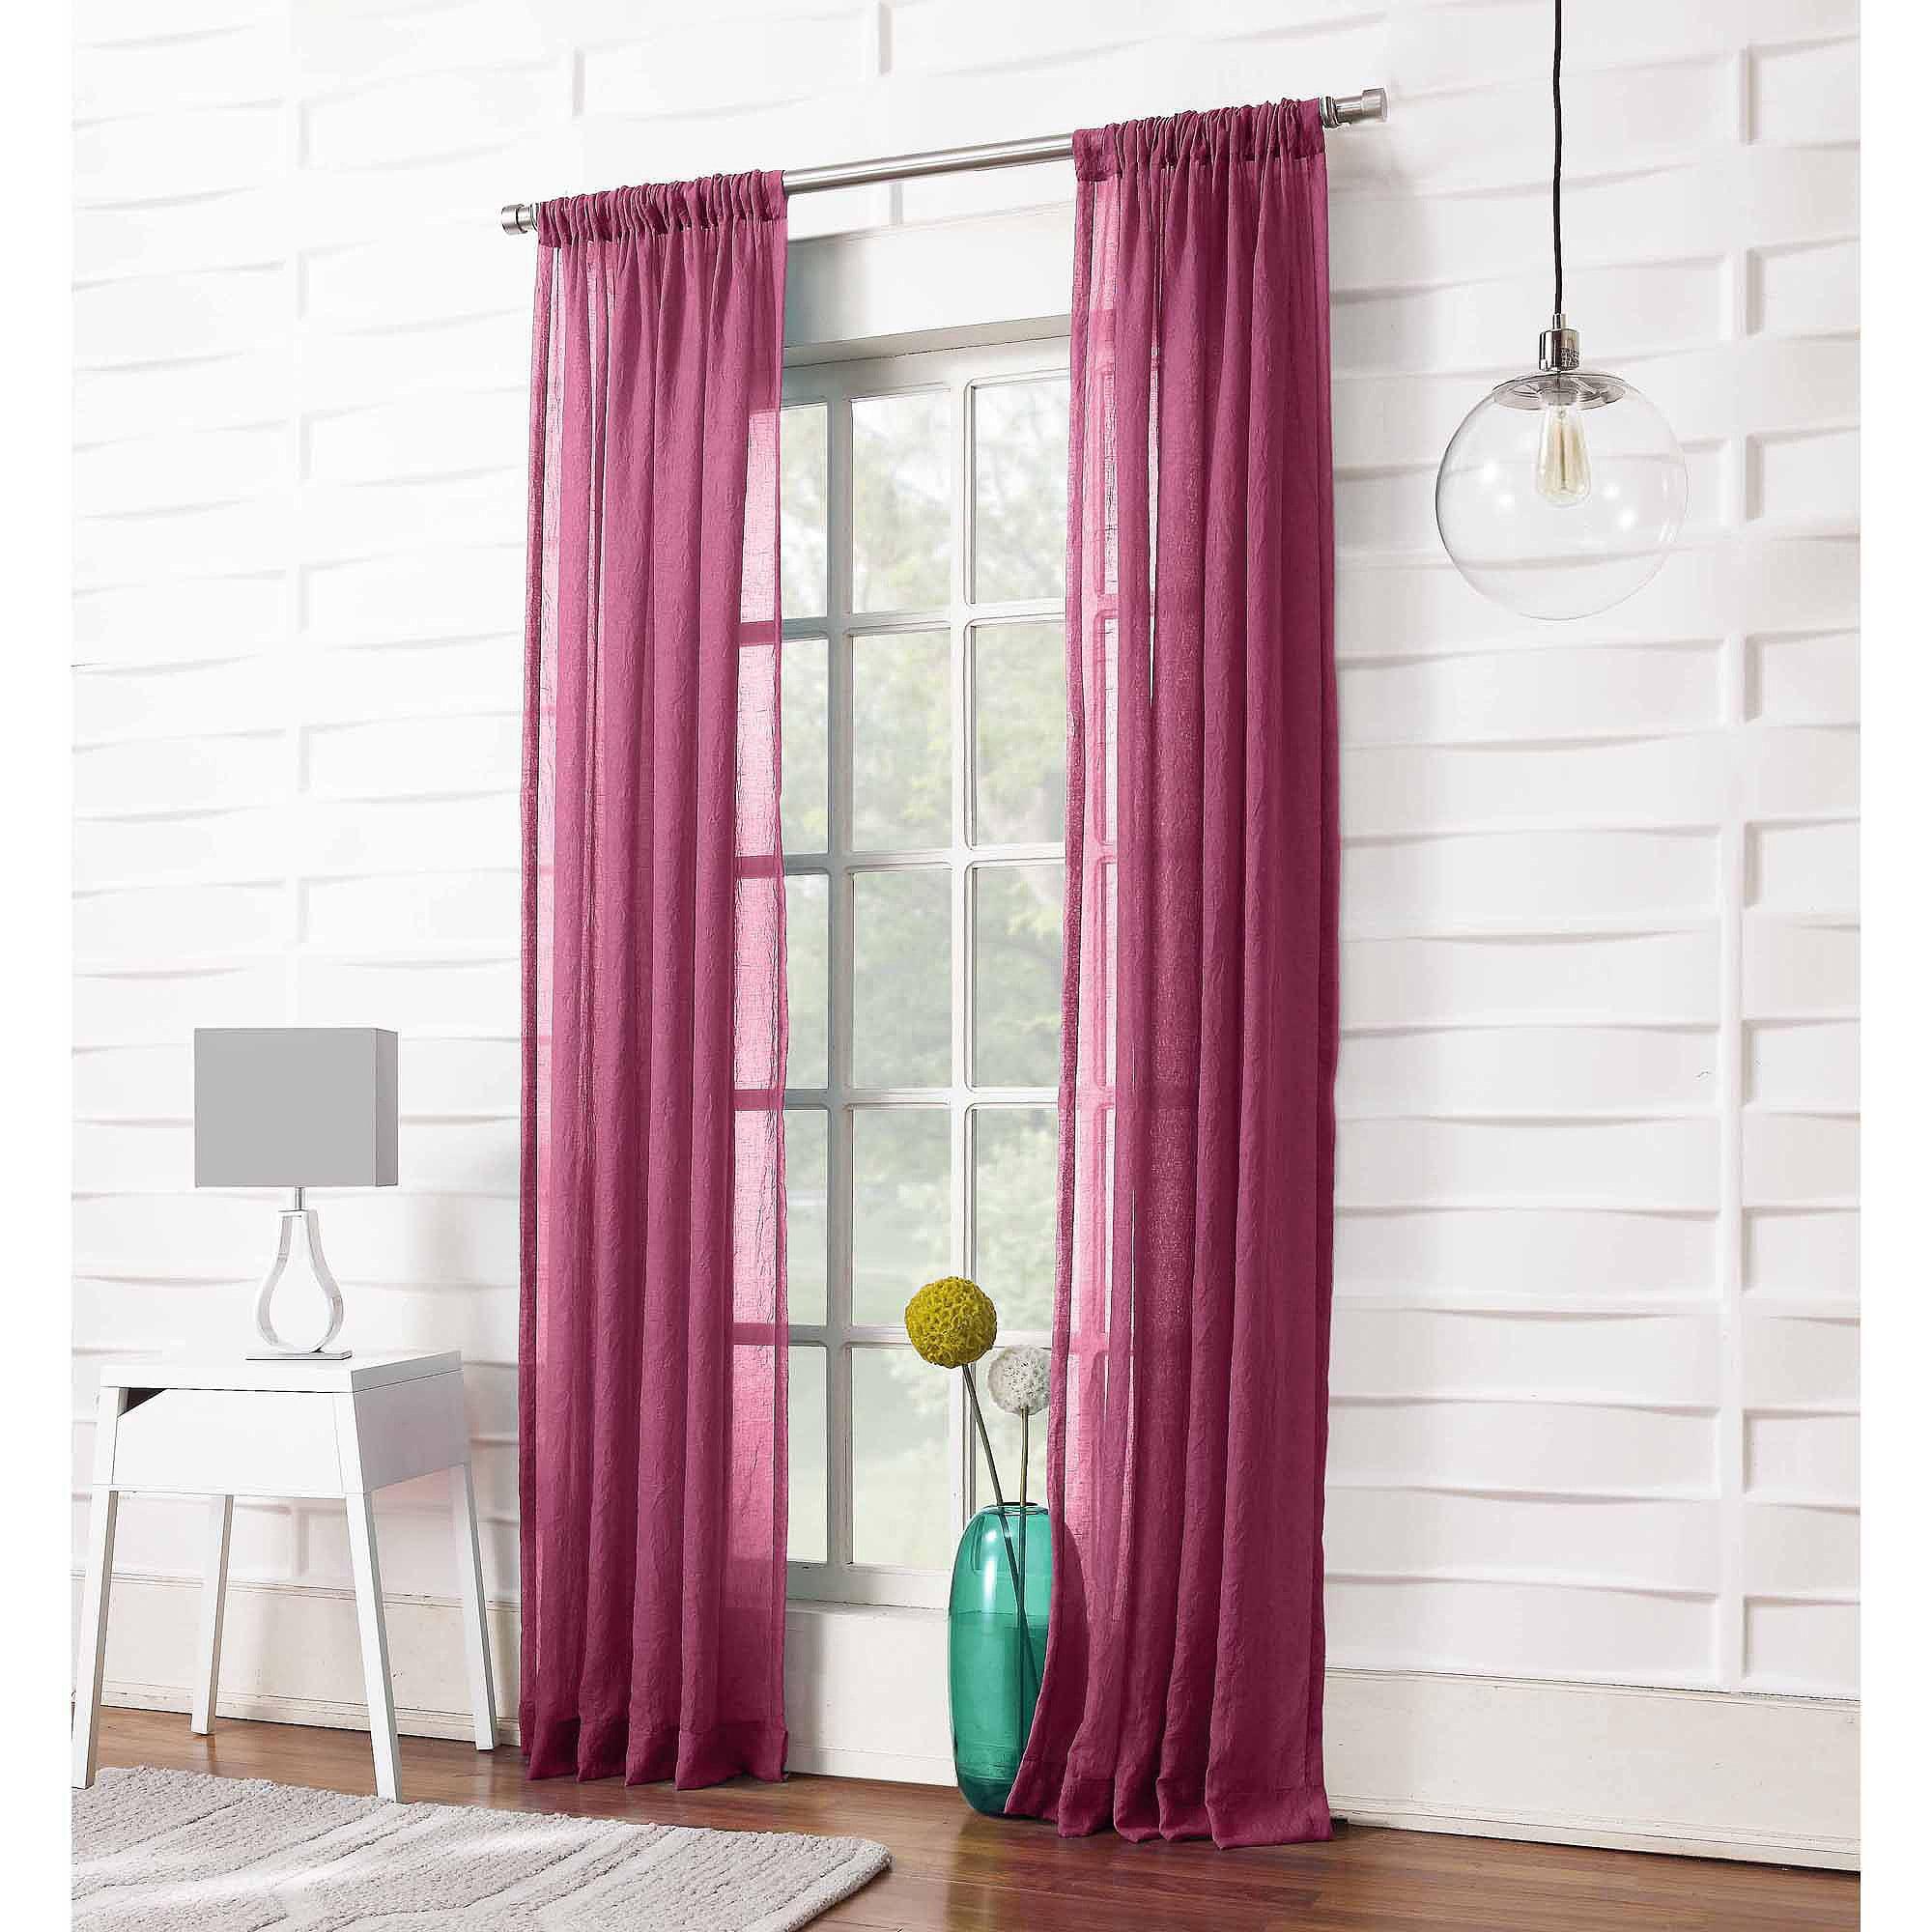 918 Millennial Intersect Geometric Semi Sheer Grommet Single Curtain Panel